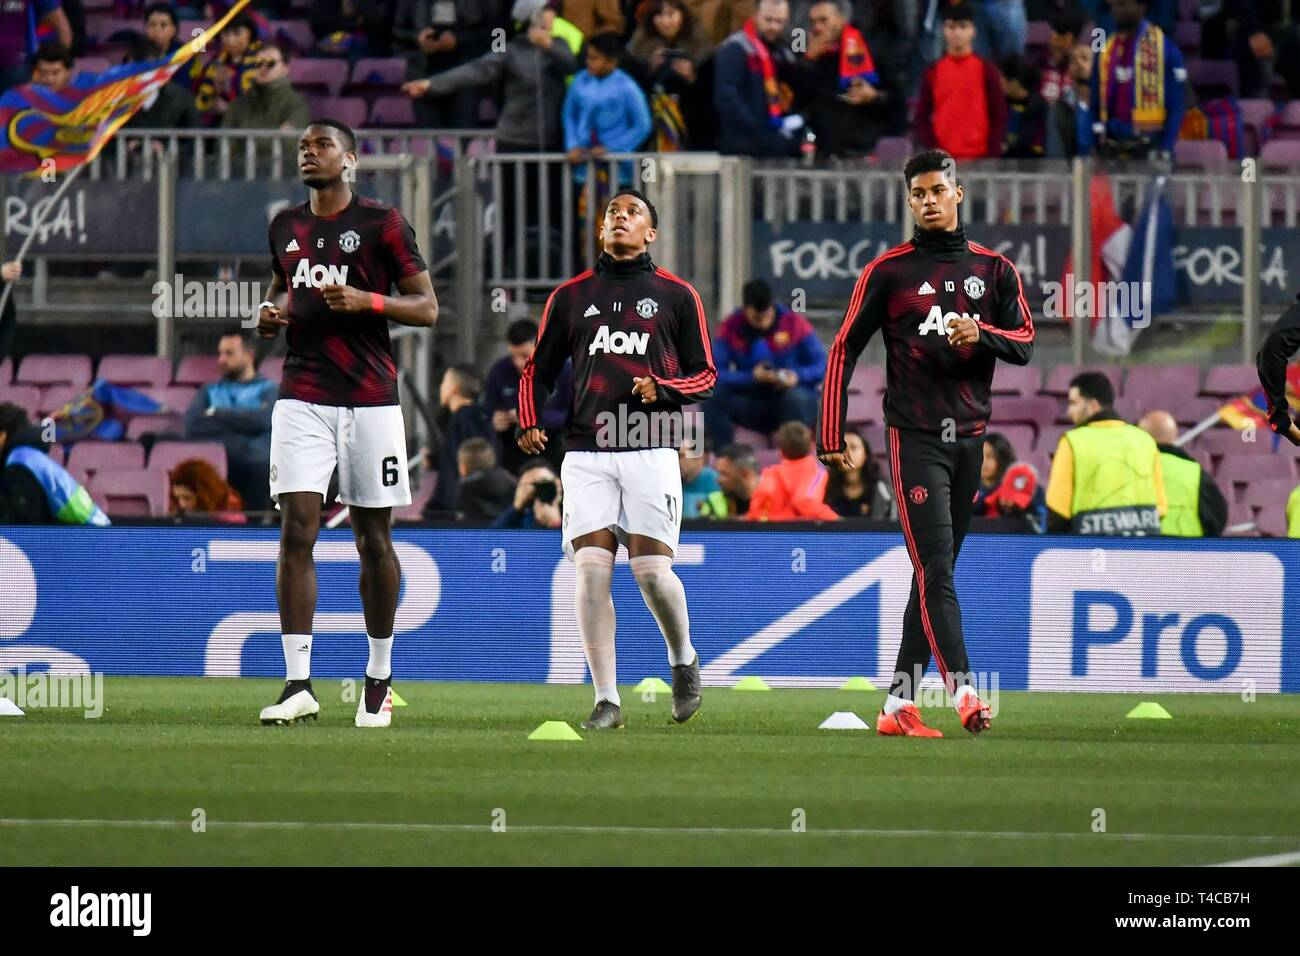 2d5cf8da15f Barcelona Manchester United Stock Photos   Barcelona Manchester ...